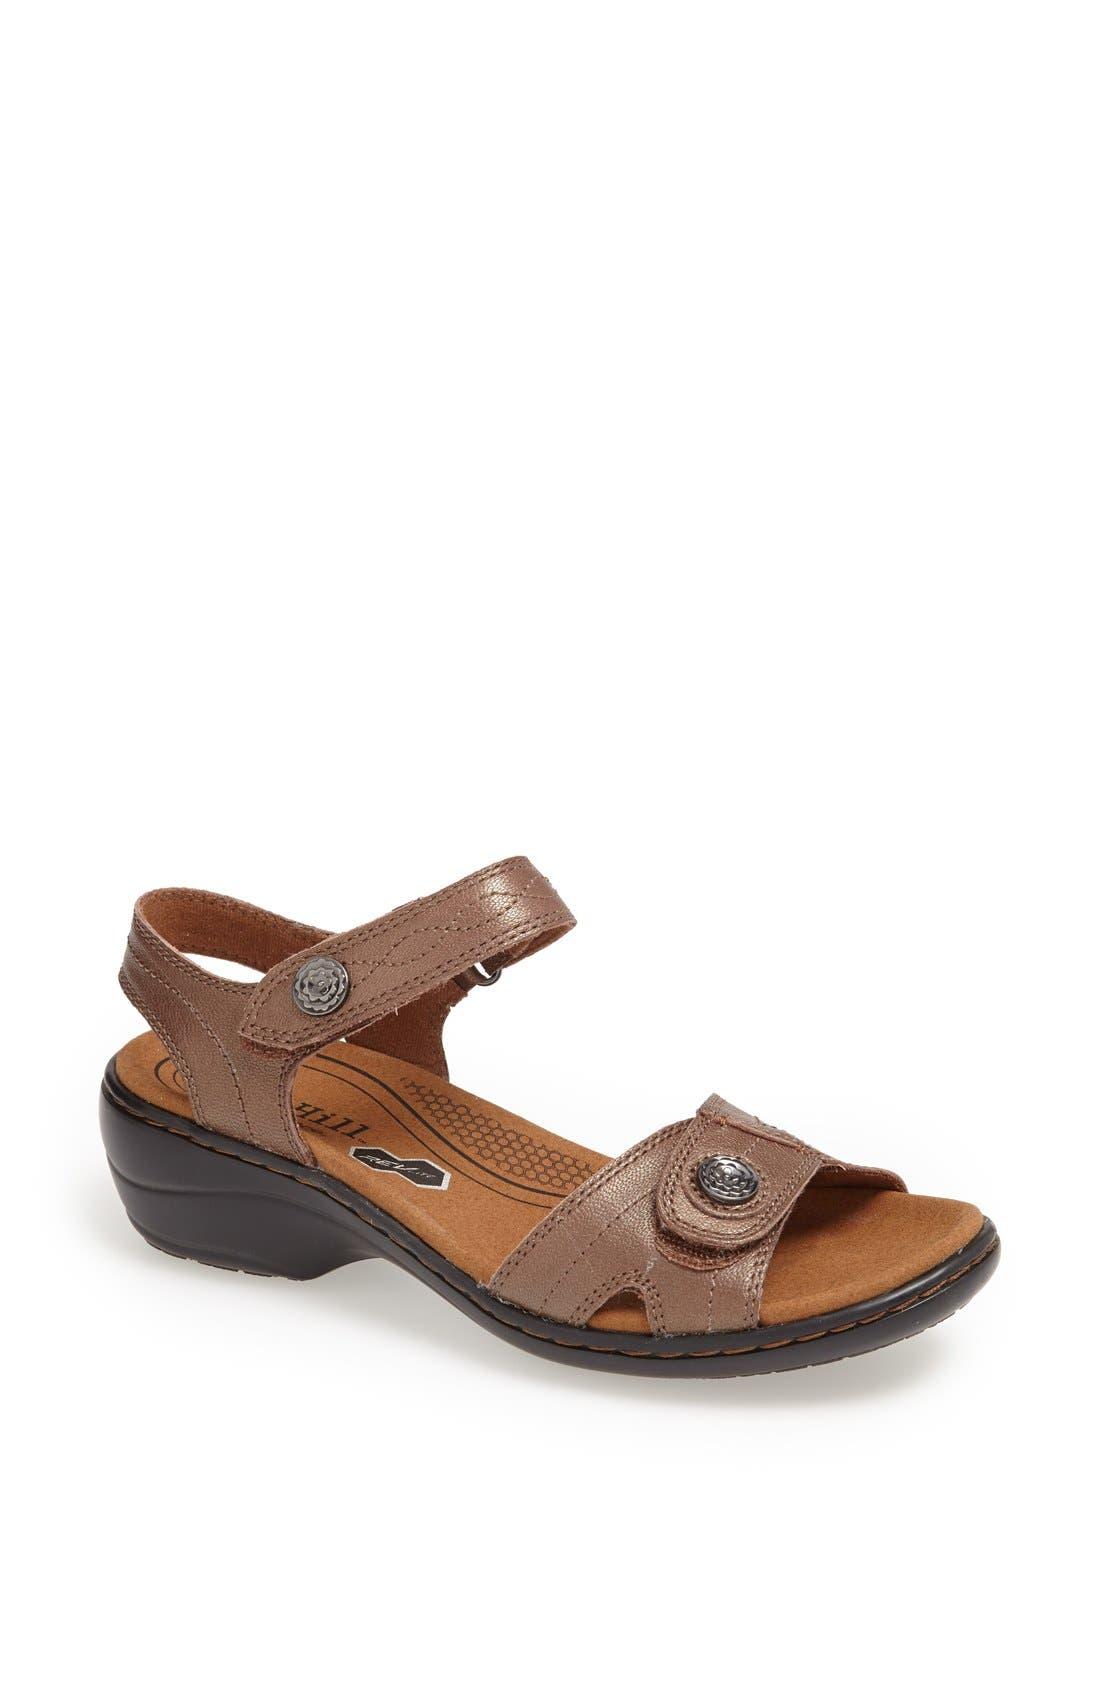 Alternate Image 1 Selected - Cobb Hill 'Minx' Sandal